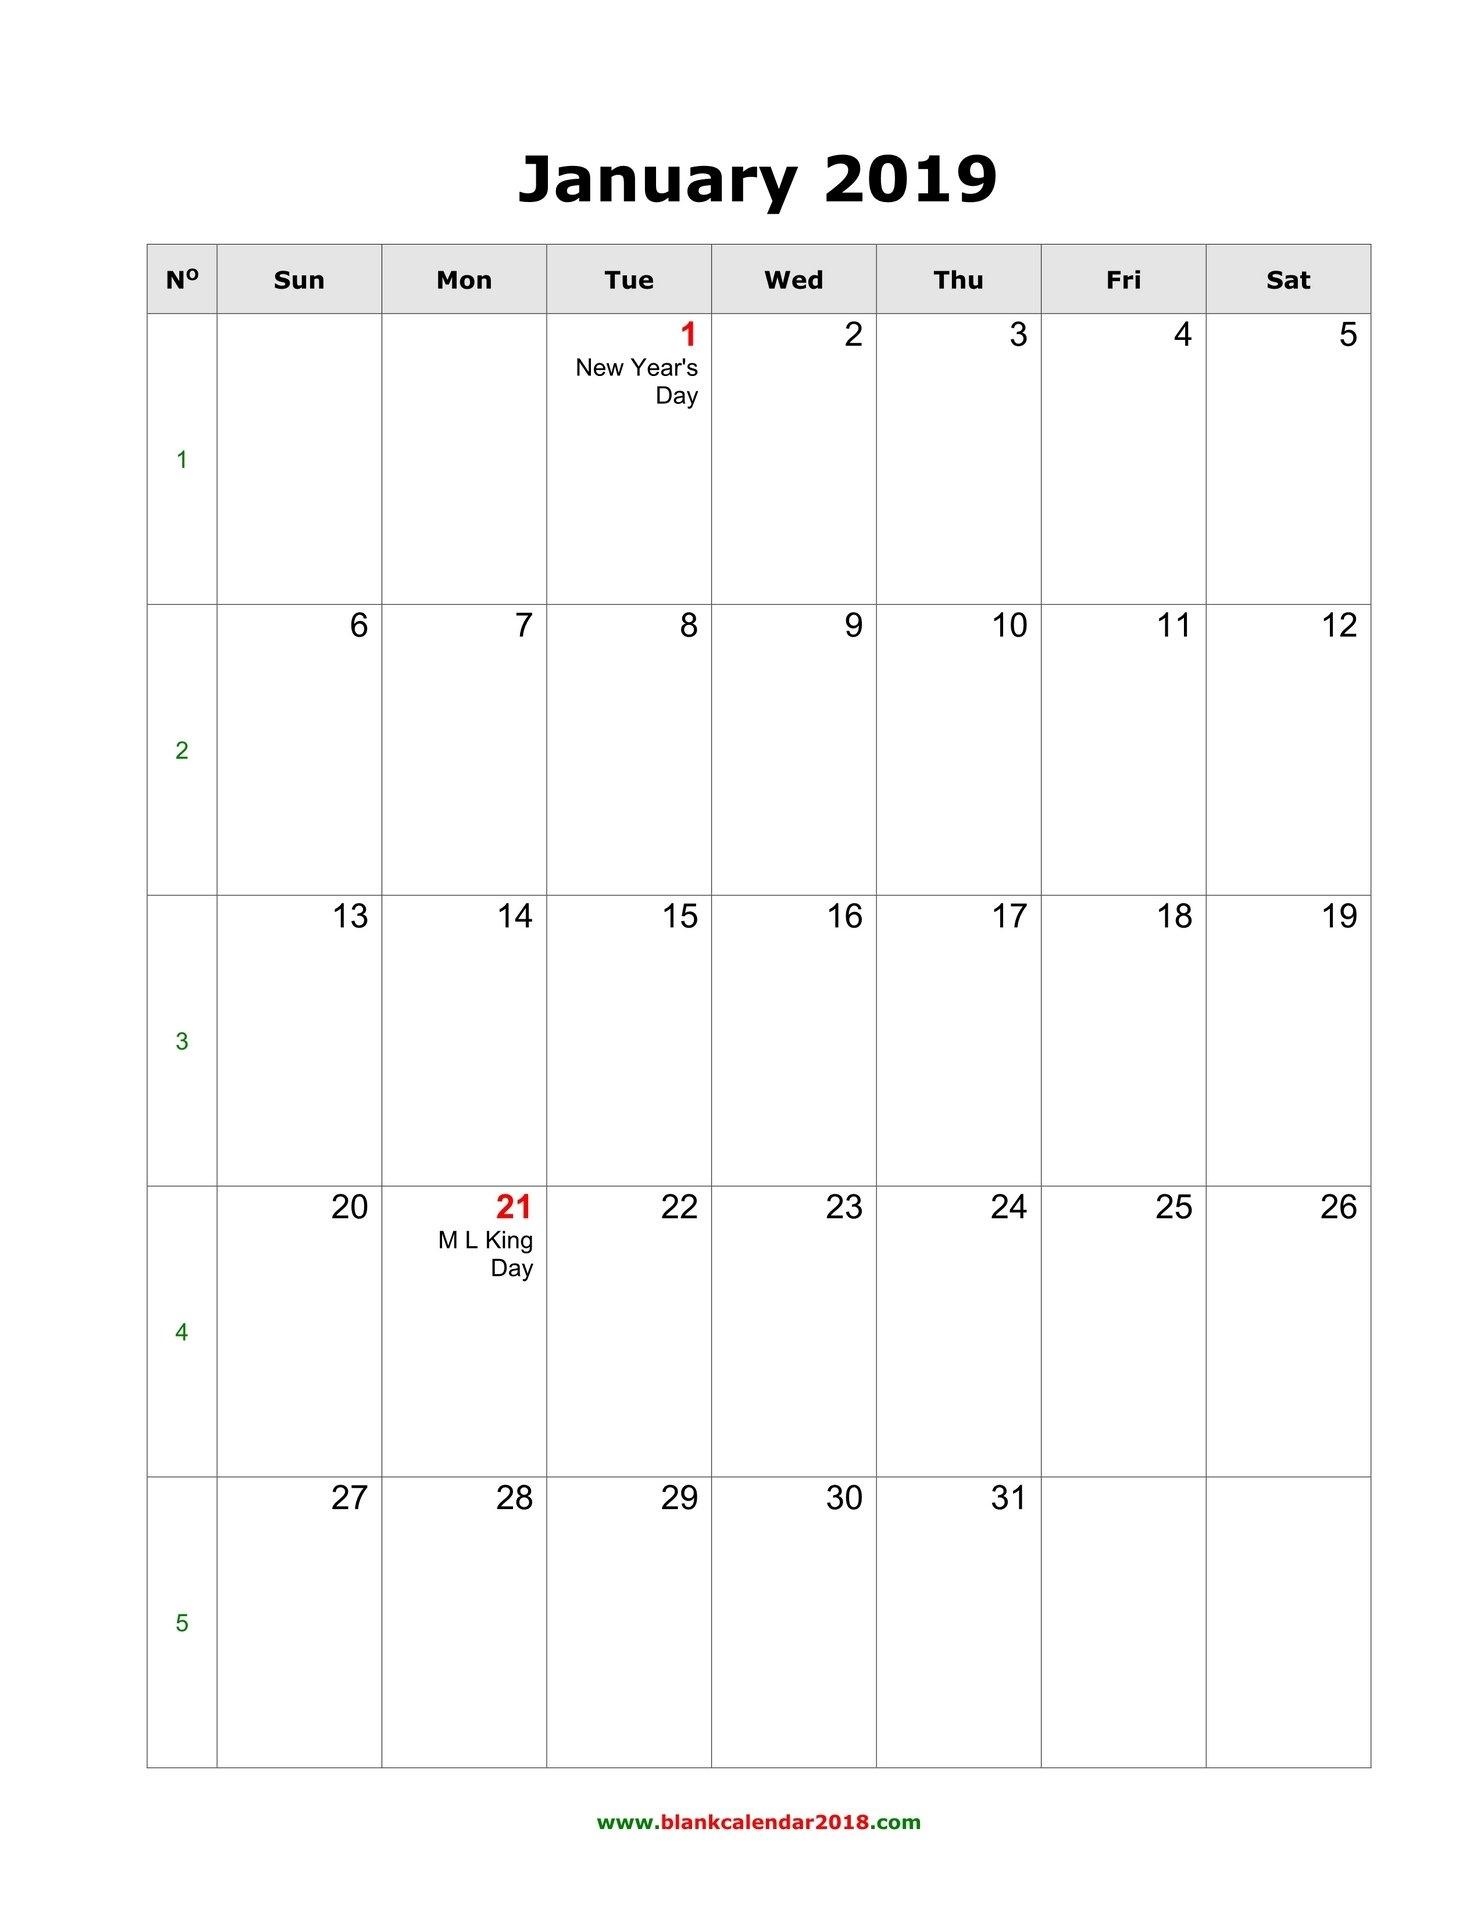 Blank Calendar 2019 Calendar 2019 Monthly Printable With Holidays